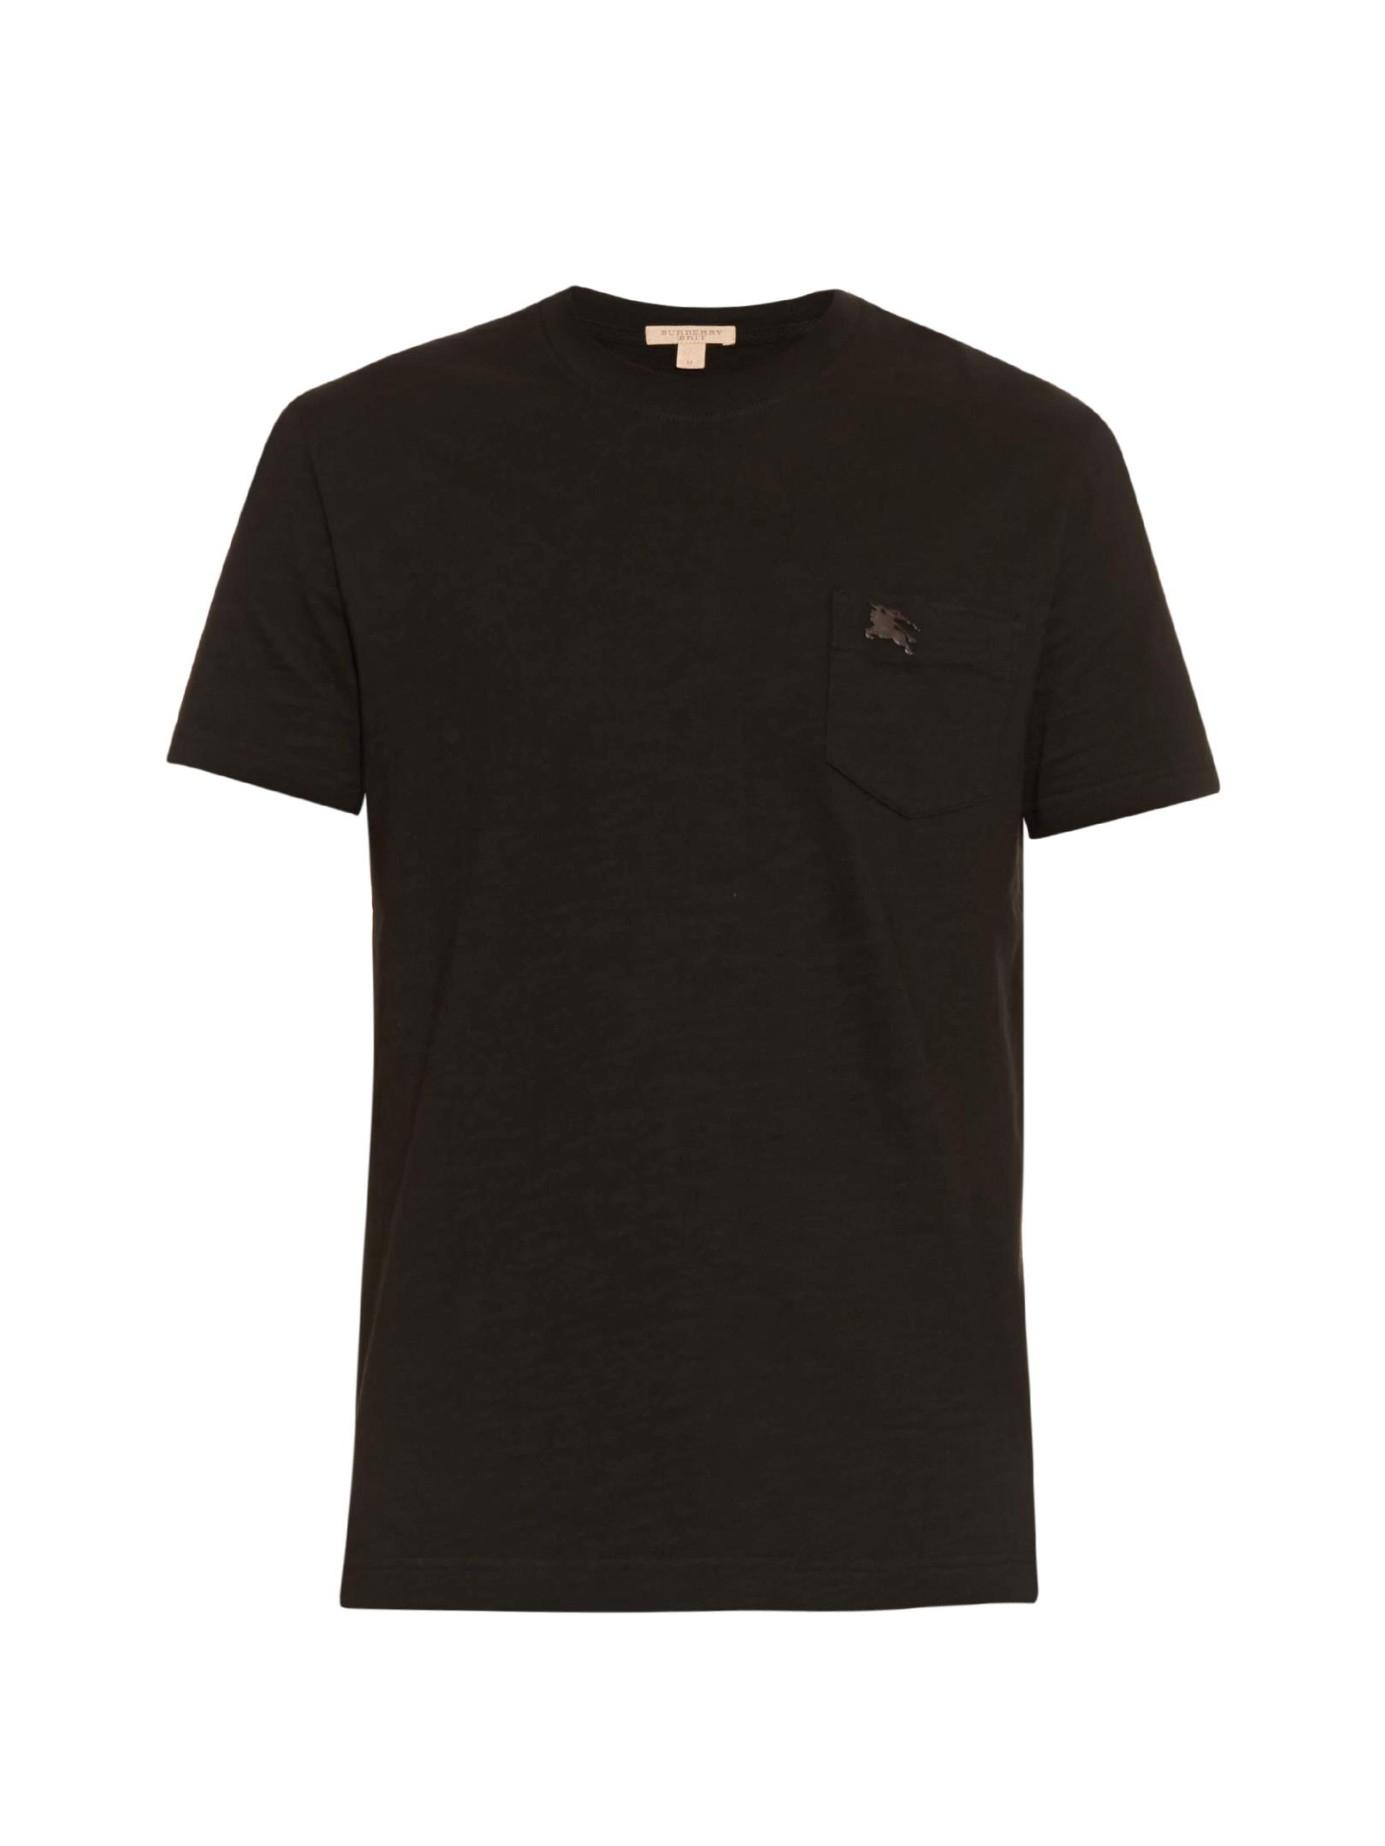 Burberry brit Ashland Cotton T-shirt in Black for Men | Lyst